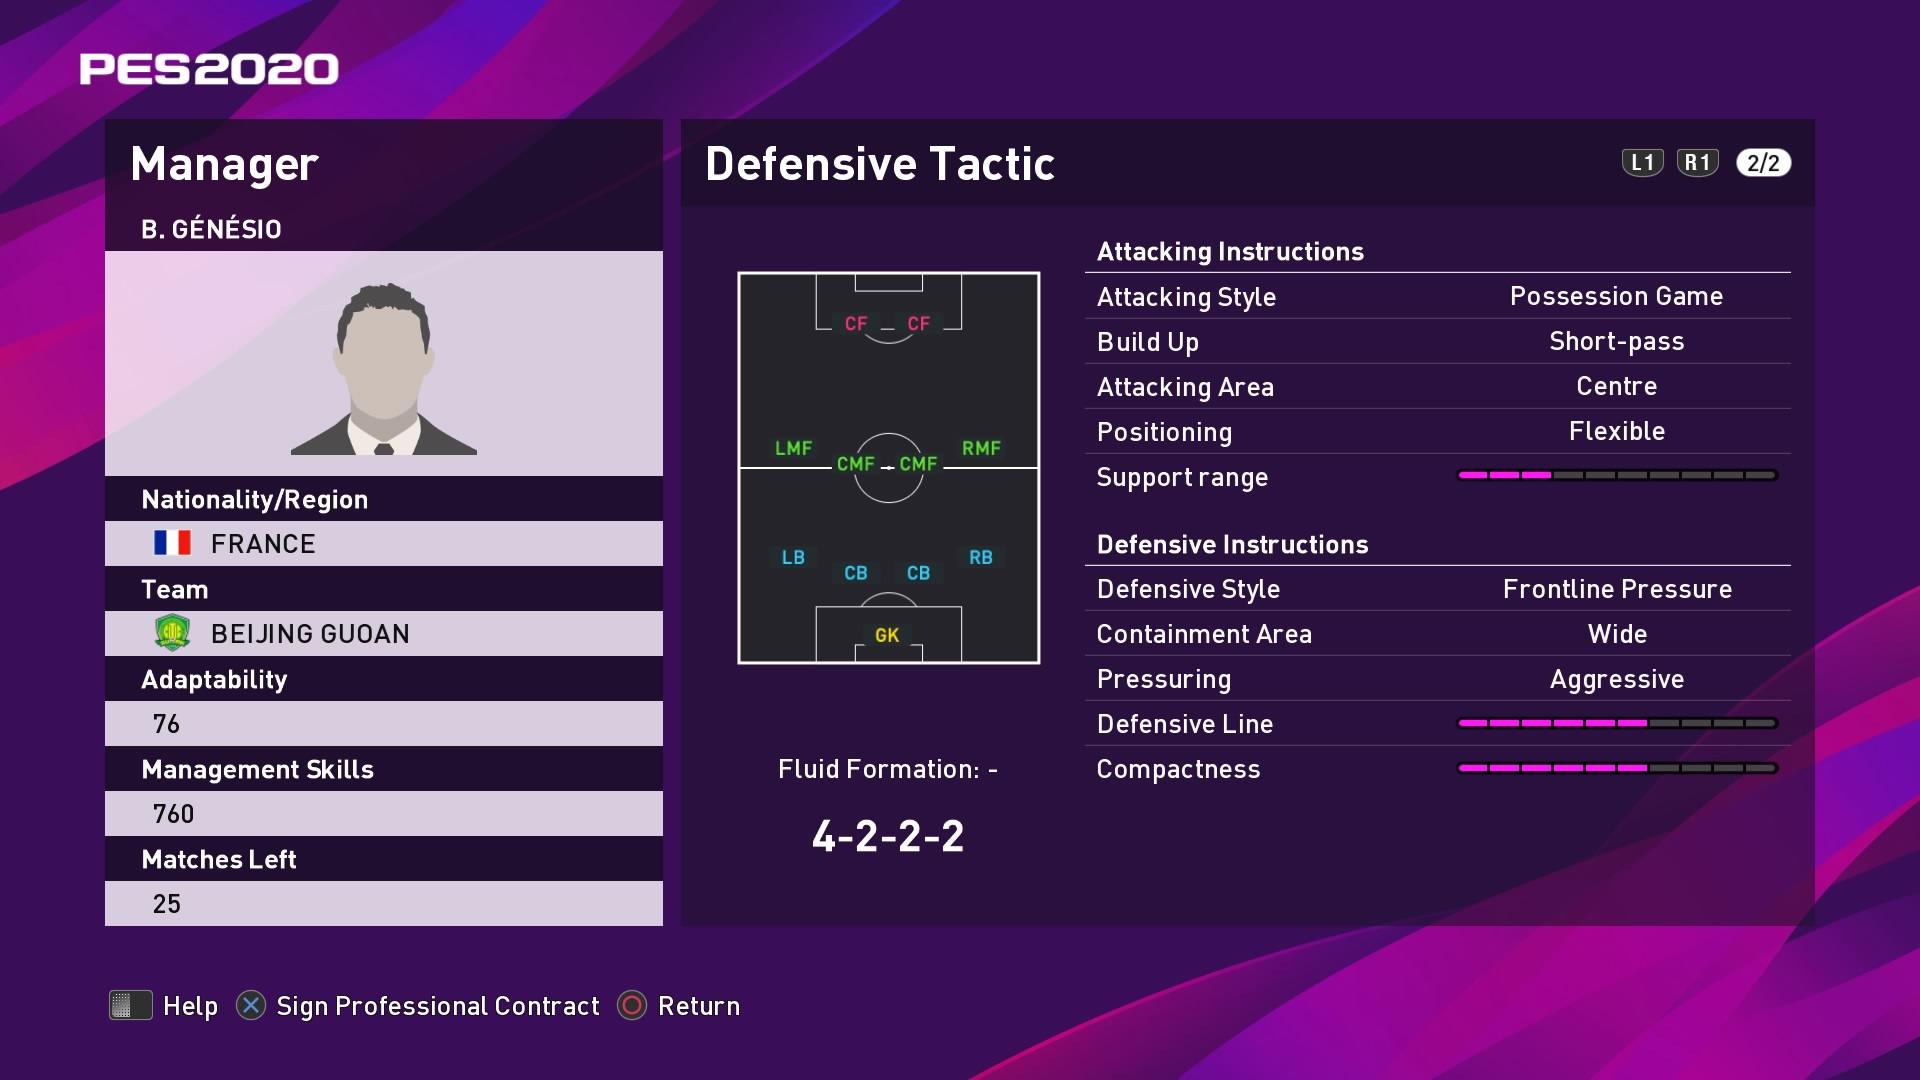 B. Génésio (Bruno Génésio) Defensive Tactic in PES 2020 myClub